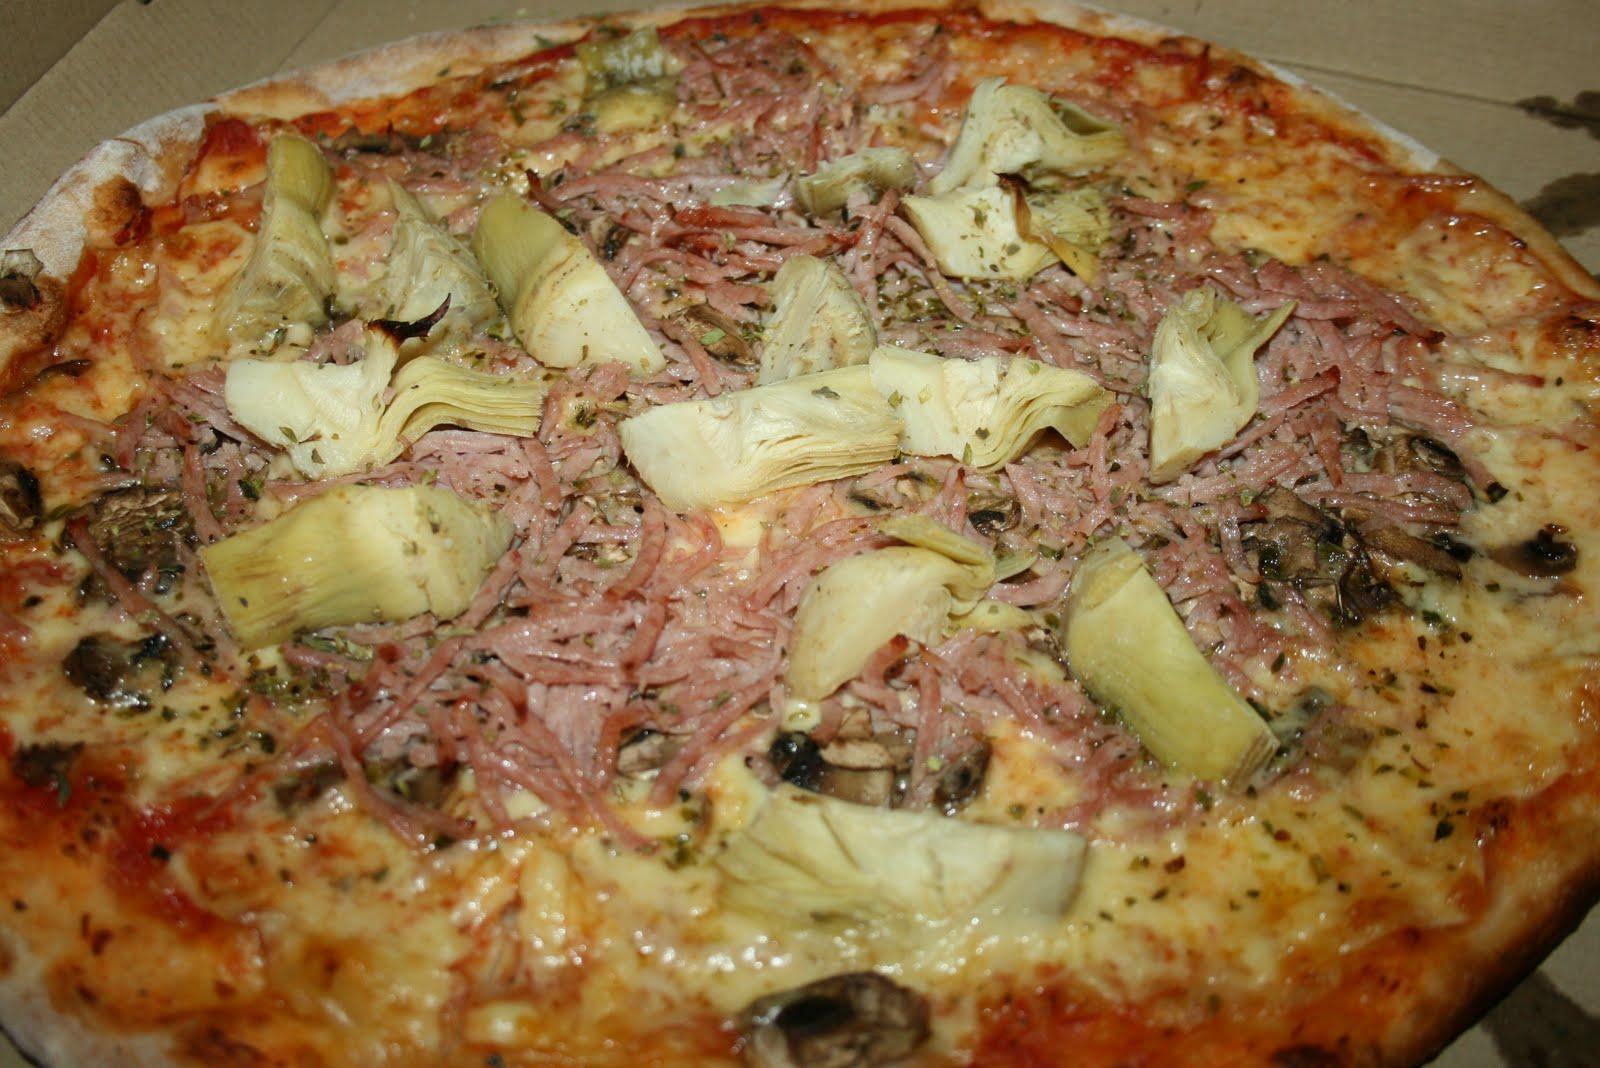 Pizzaoline